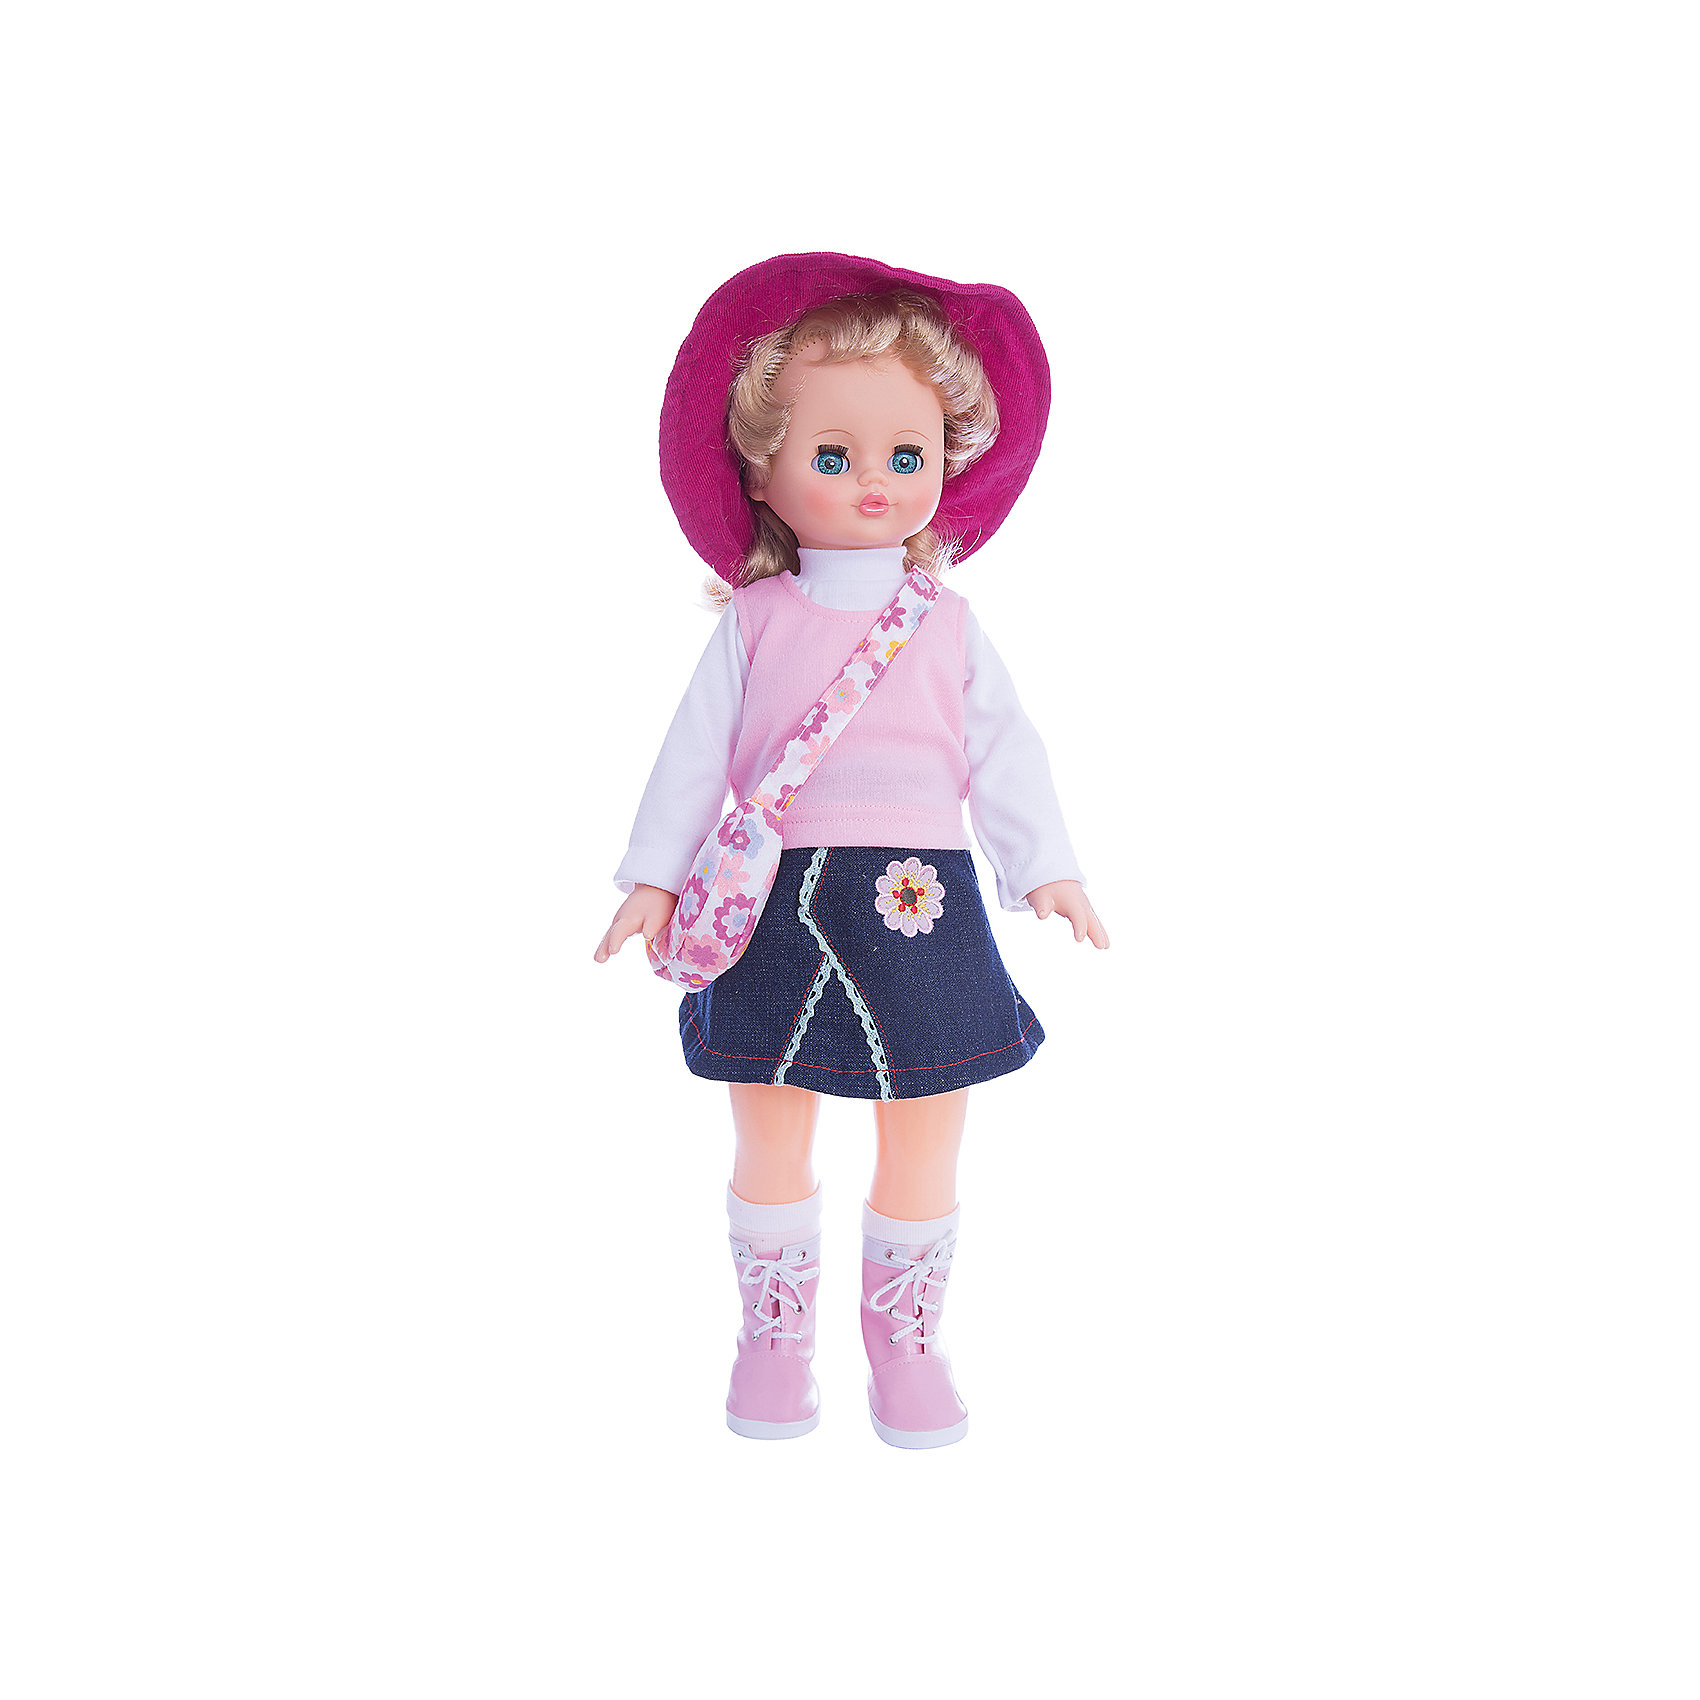 Весна Кукла Алиса, со звуком, 55 см, Весна куклы и одежда для кукол llorens кукла алиса 33 см со звуком